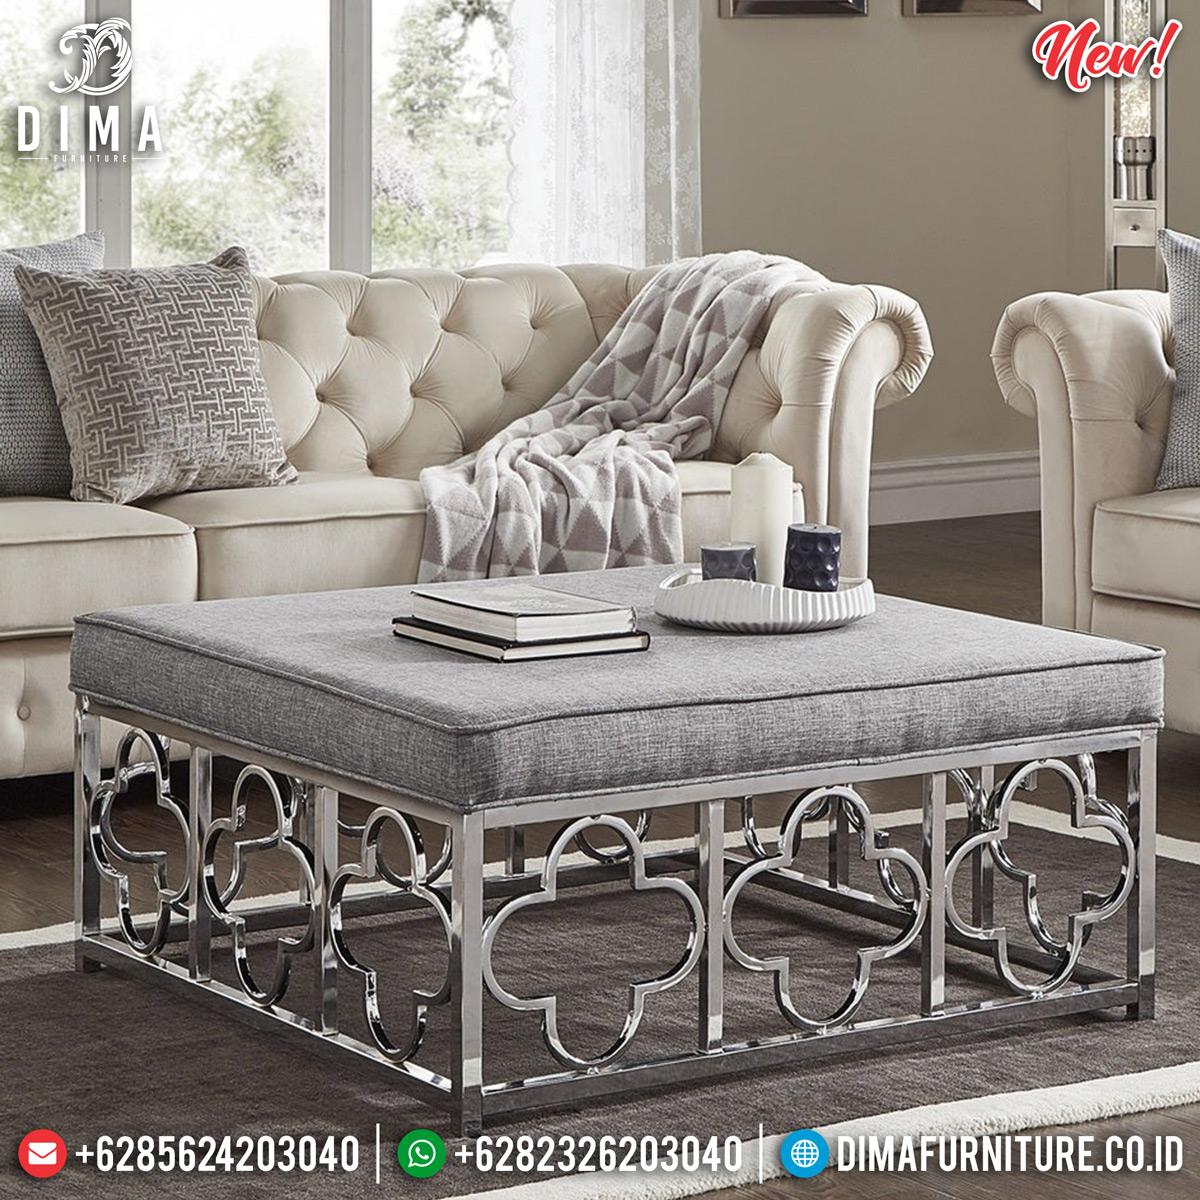 Jual Meja Tamu Minimalis Jepara Luxury Design Interior Inspiring TTJ-0832